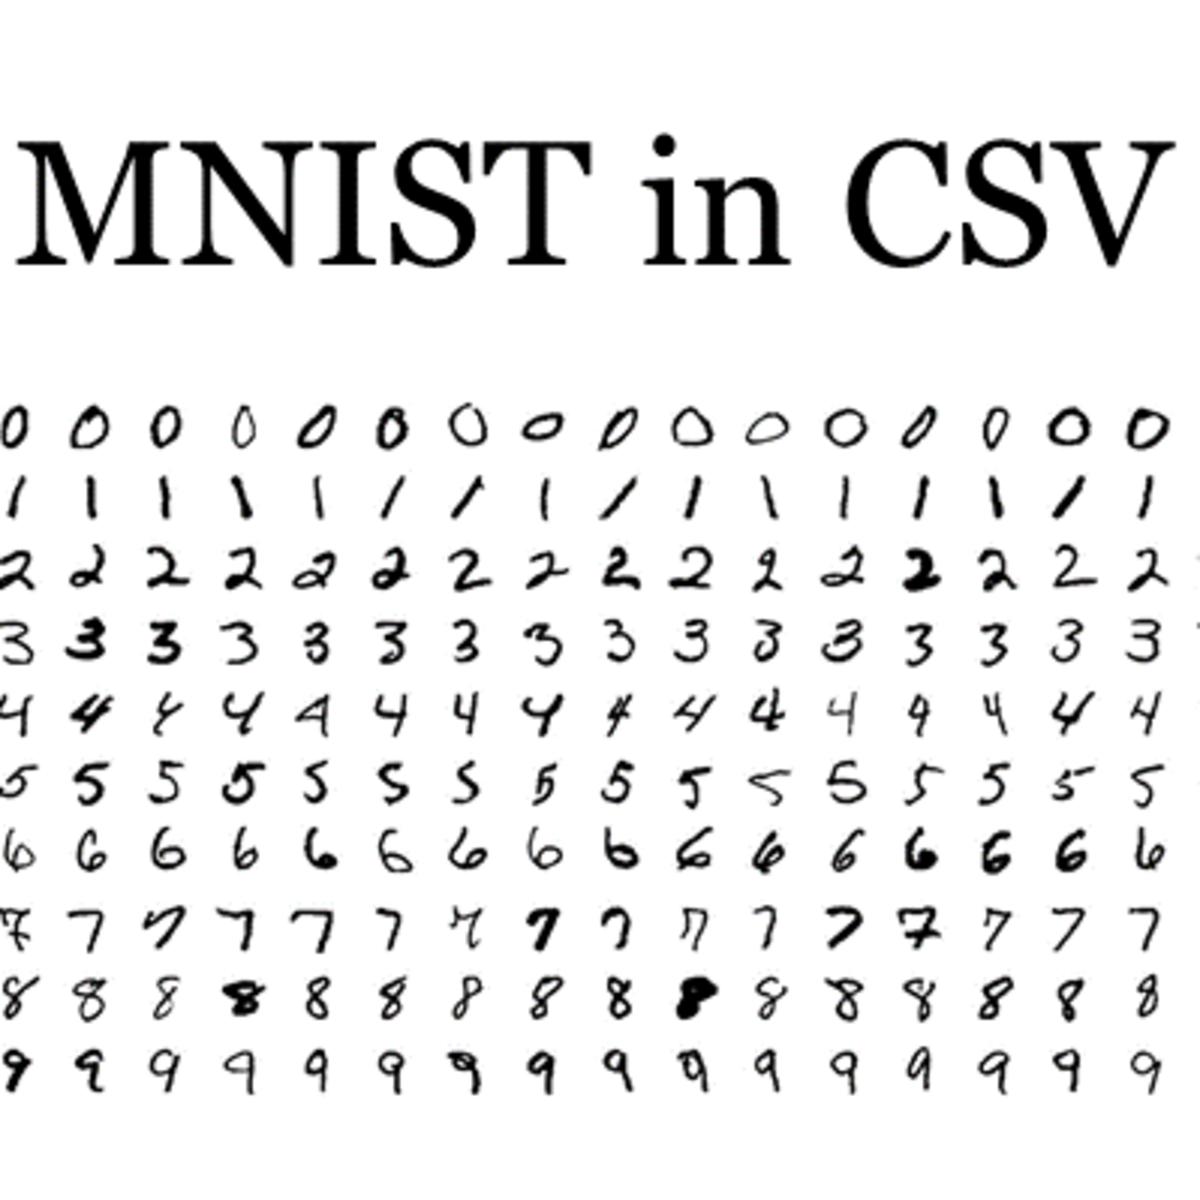 MNIST in CSV | Kaggle